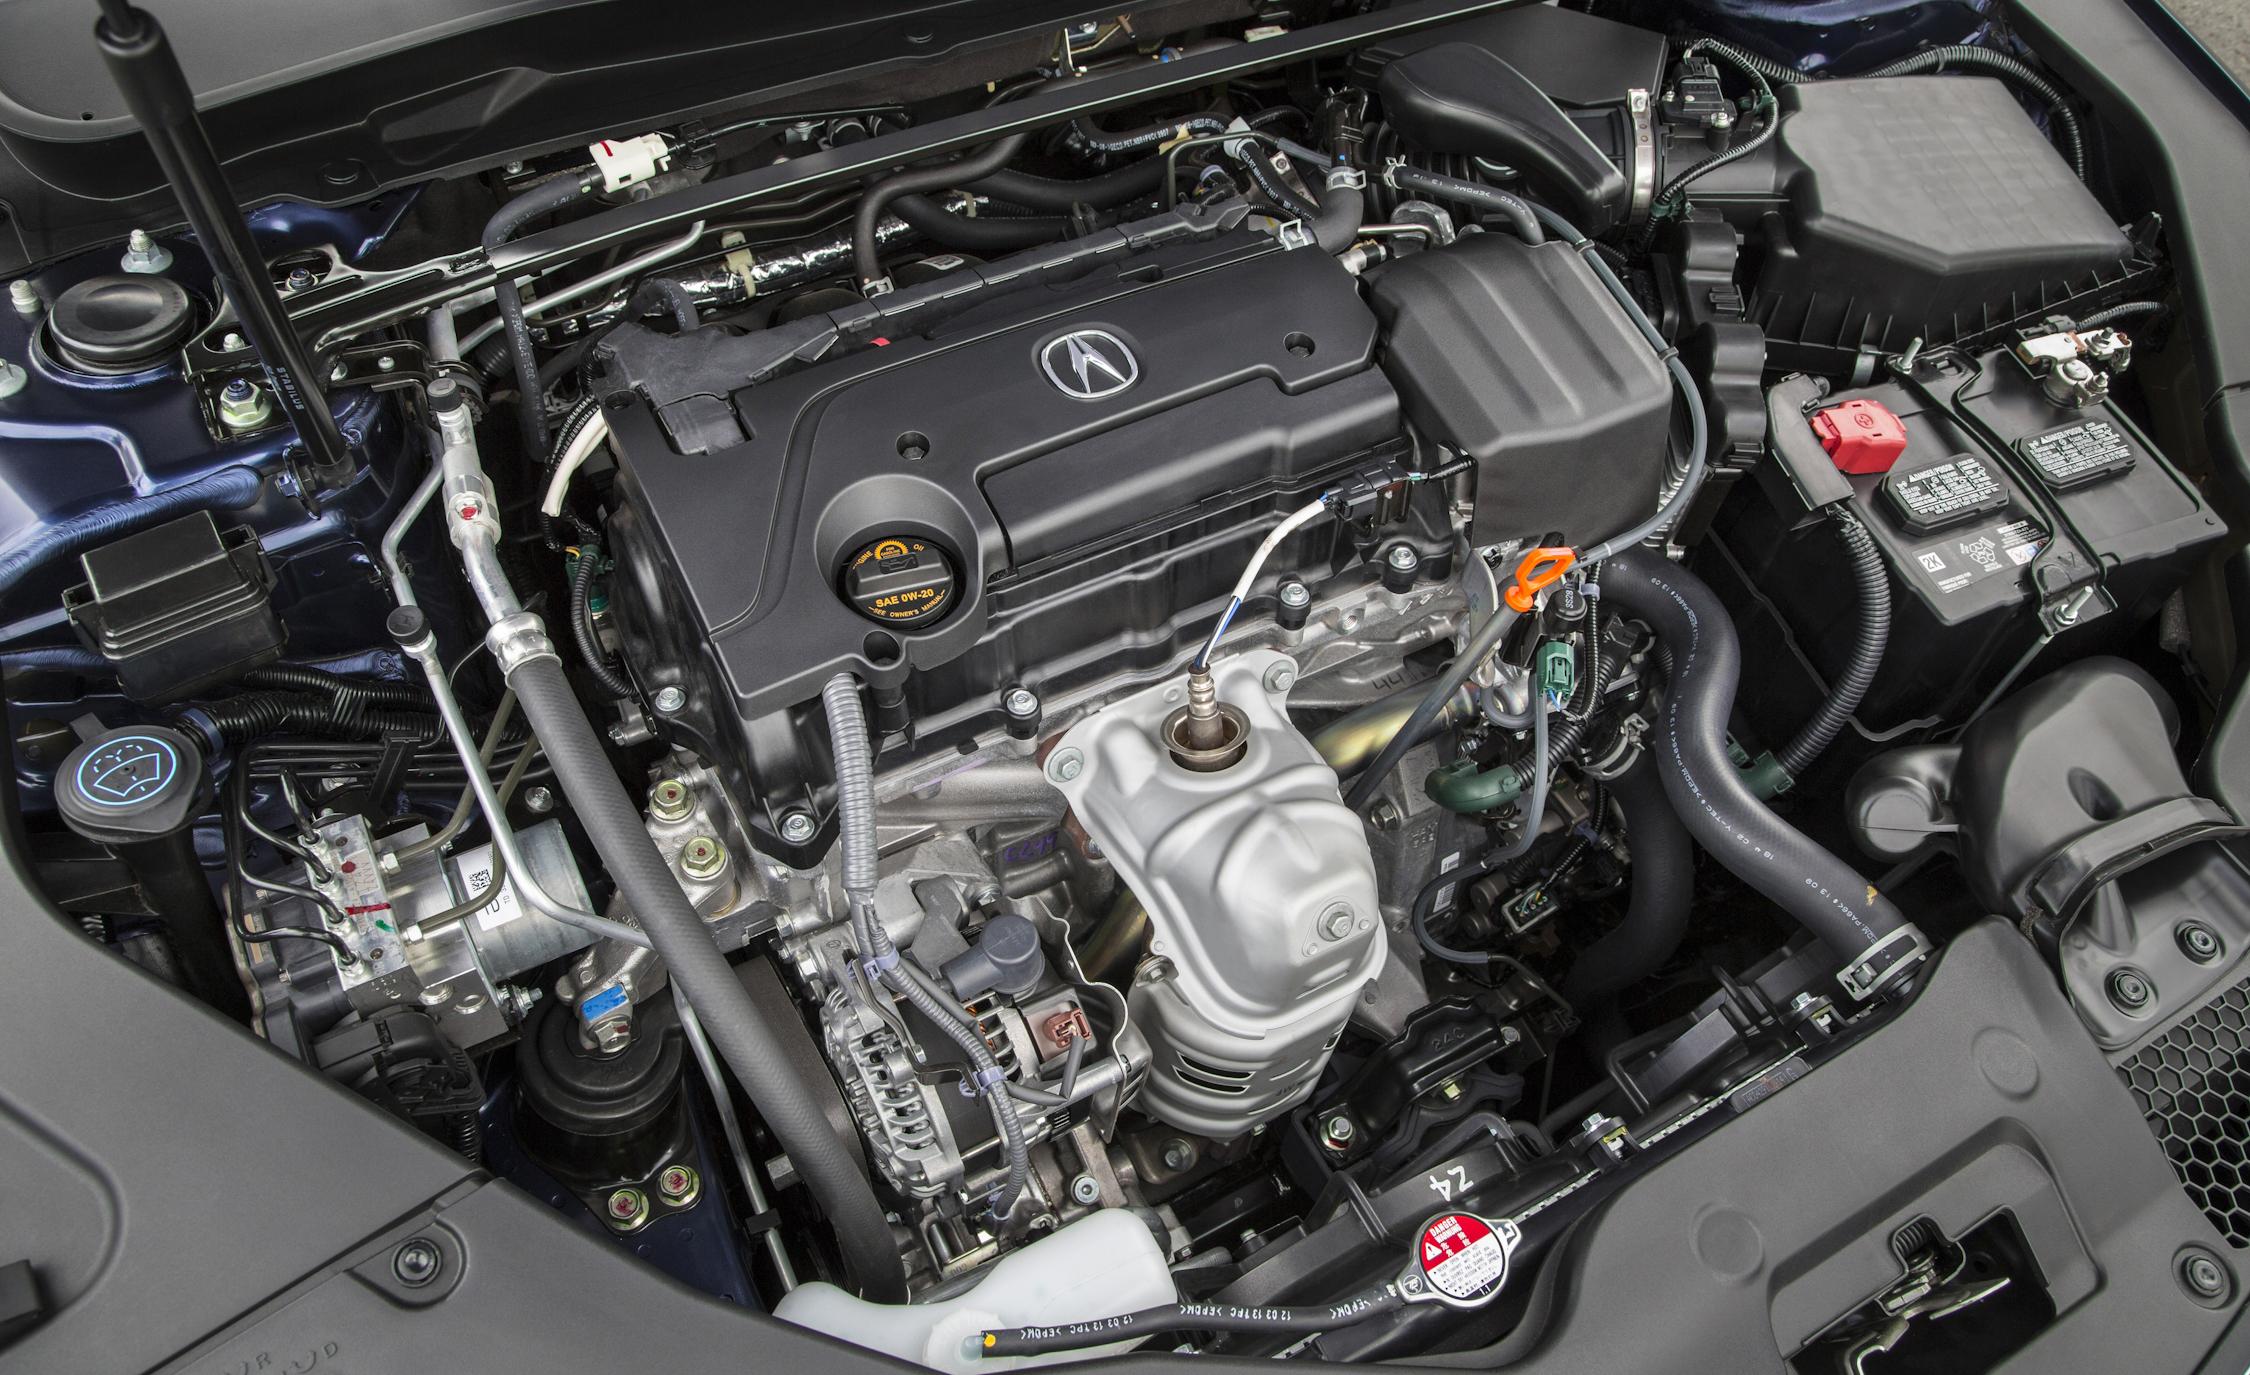 2015 Acura TLX 2.4L 2.4-Liter Inline-4 Engine